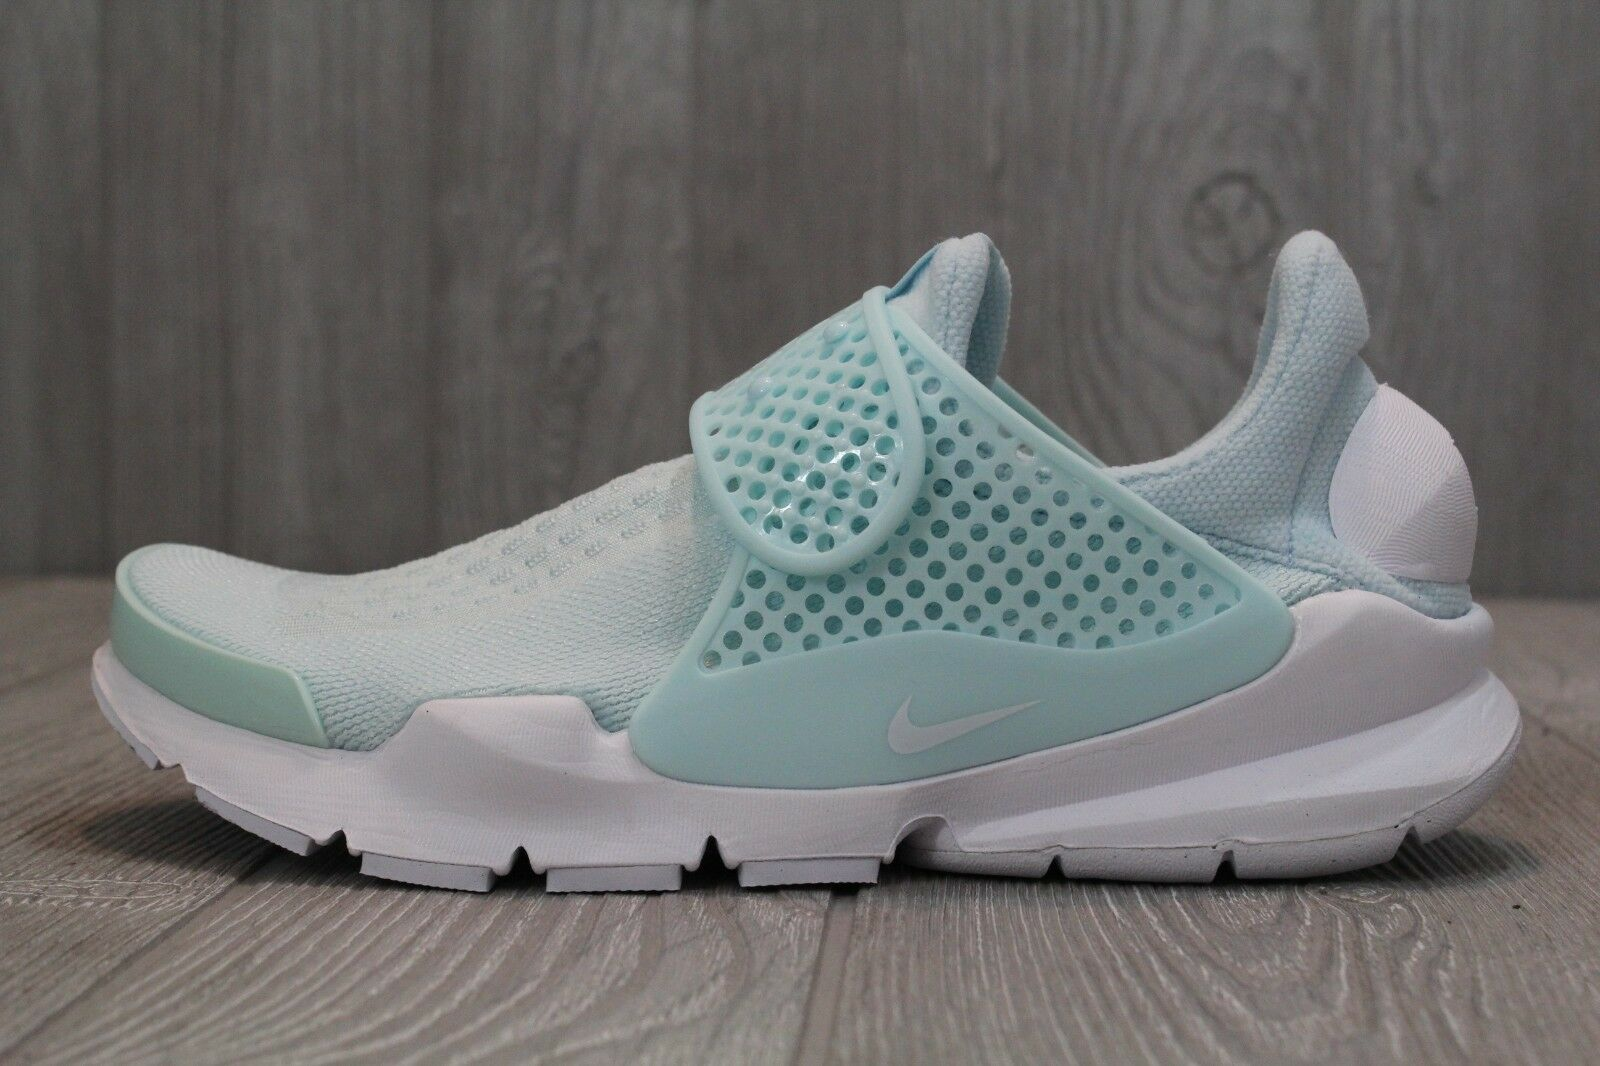 25 Nike Sock Dart Womens 848475-403 Glacier Blue Mesh Running Training Shoes 8